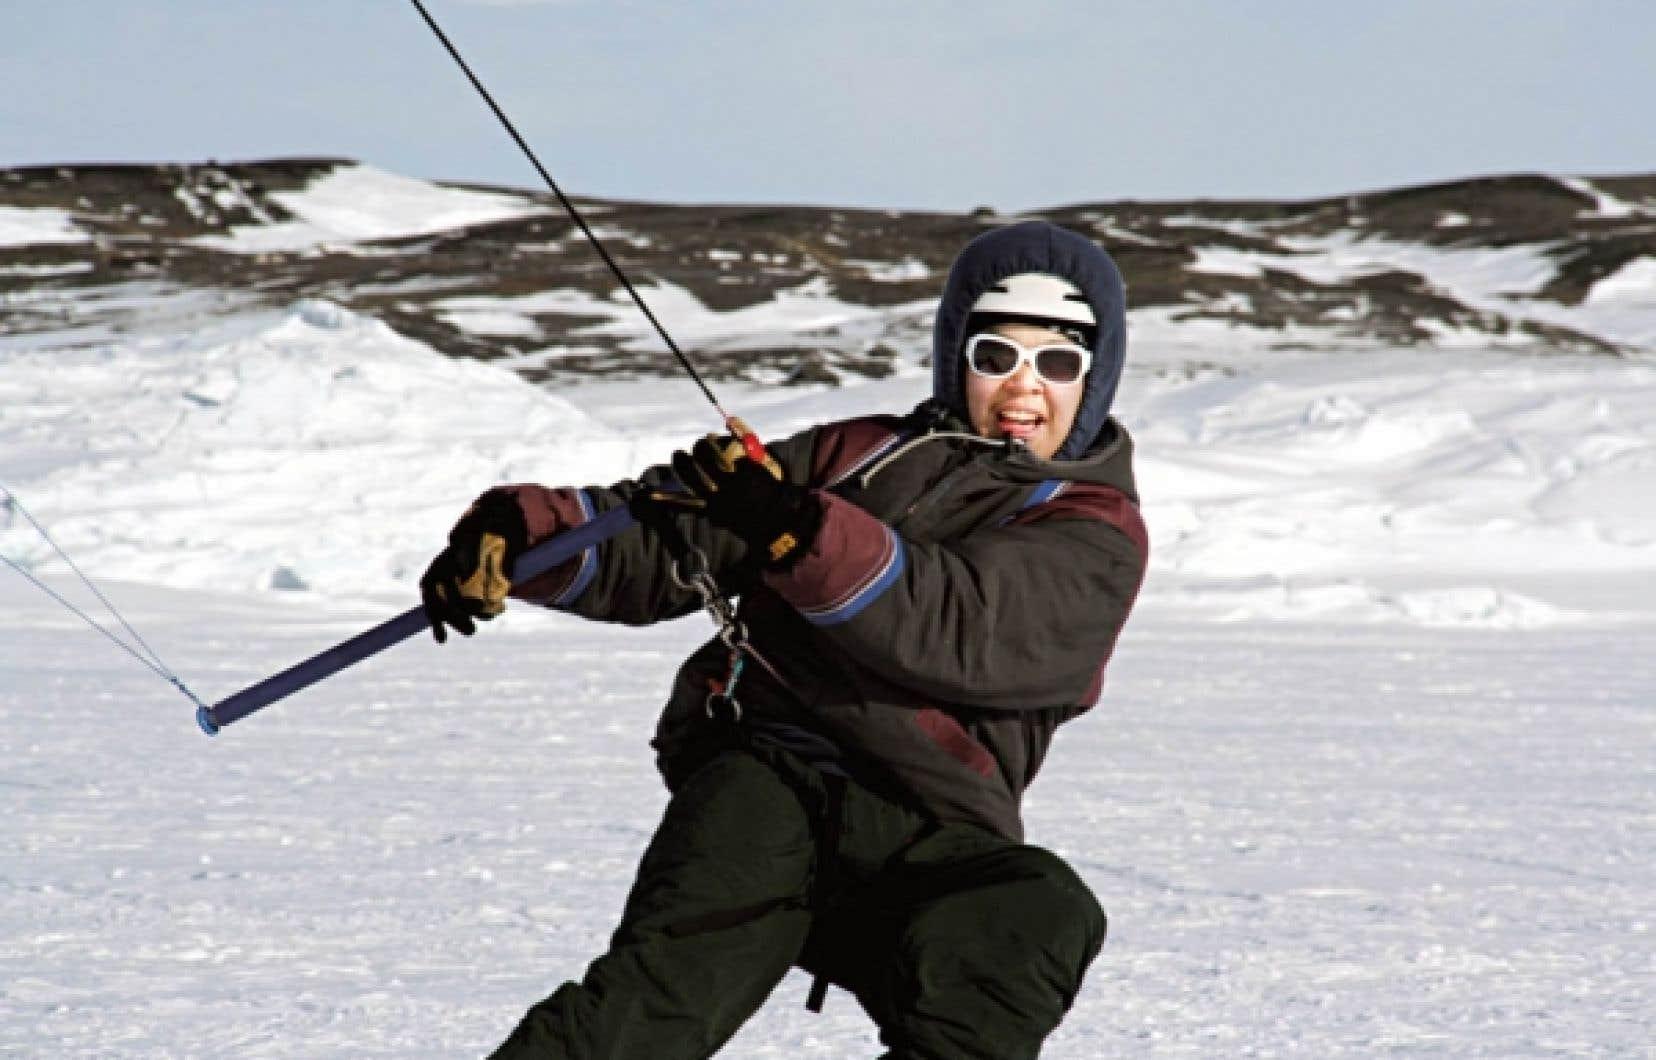 Wayne Putulik, un jeune gar&ccedil;on du Nunavut, pratiquant le paraski &agrave; Whale Cove.<br />